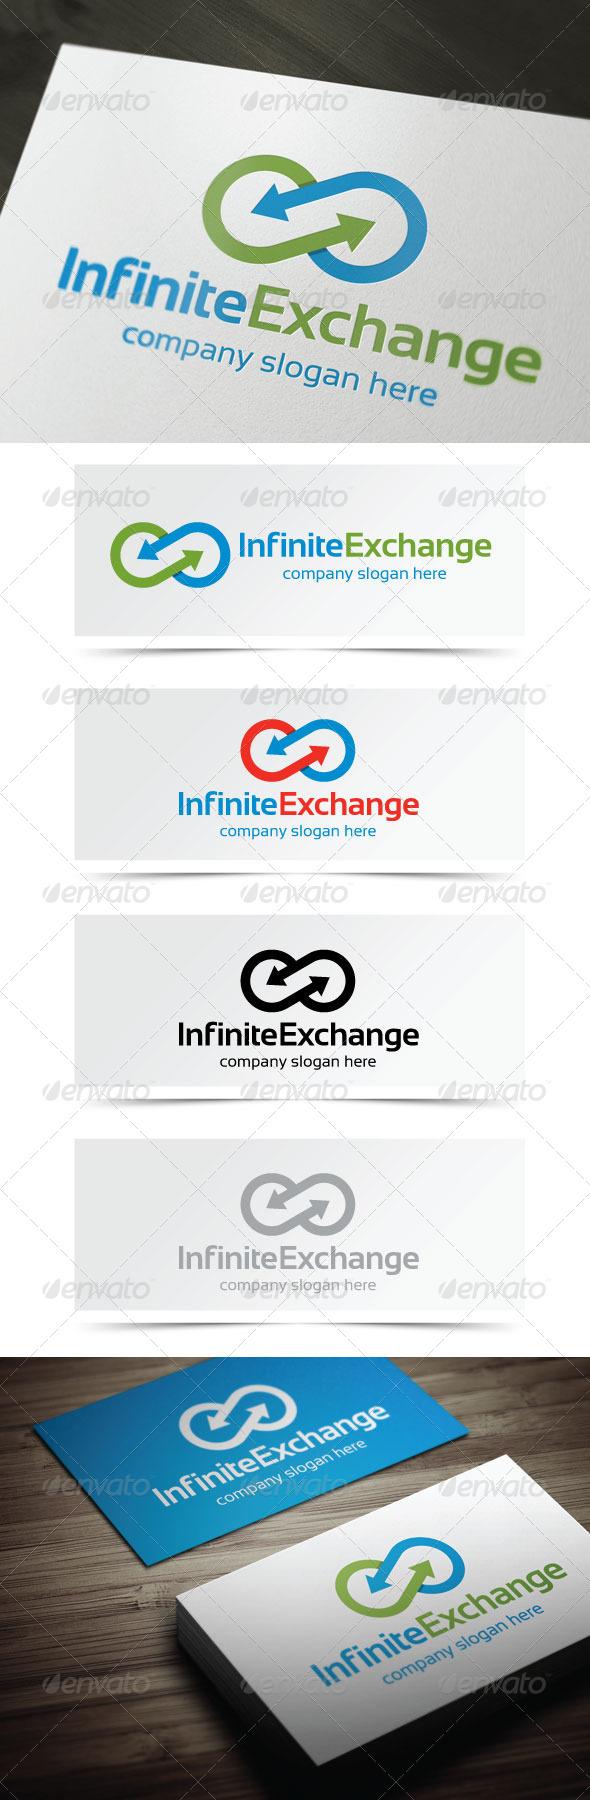 GraphicRiver Infinite Exchange 5336641